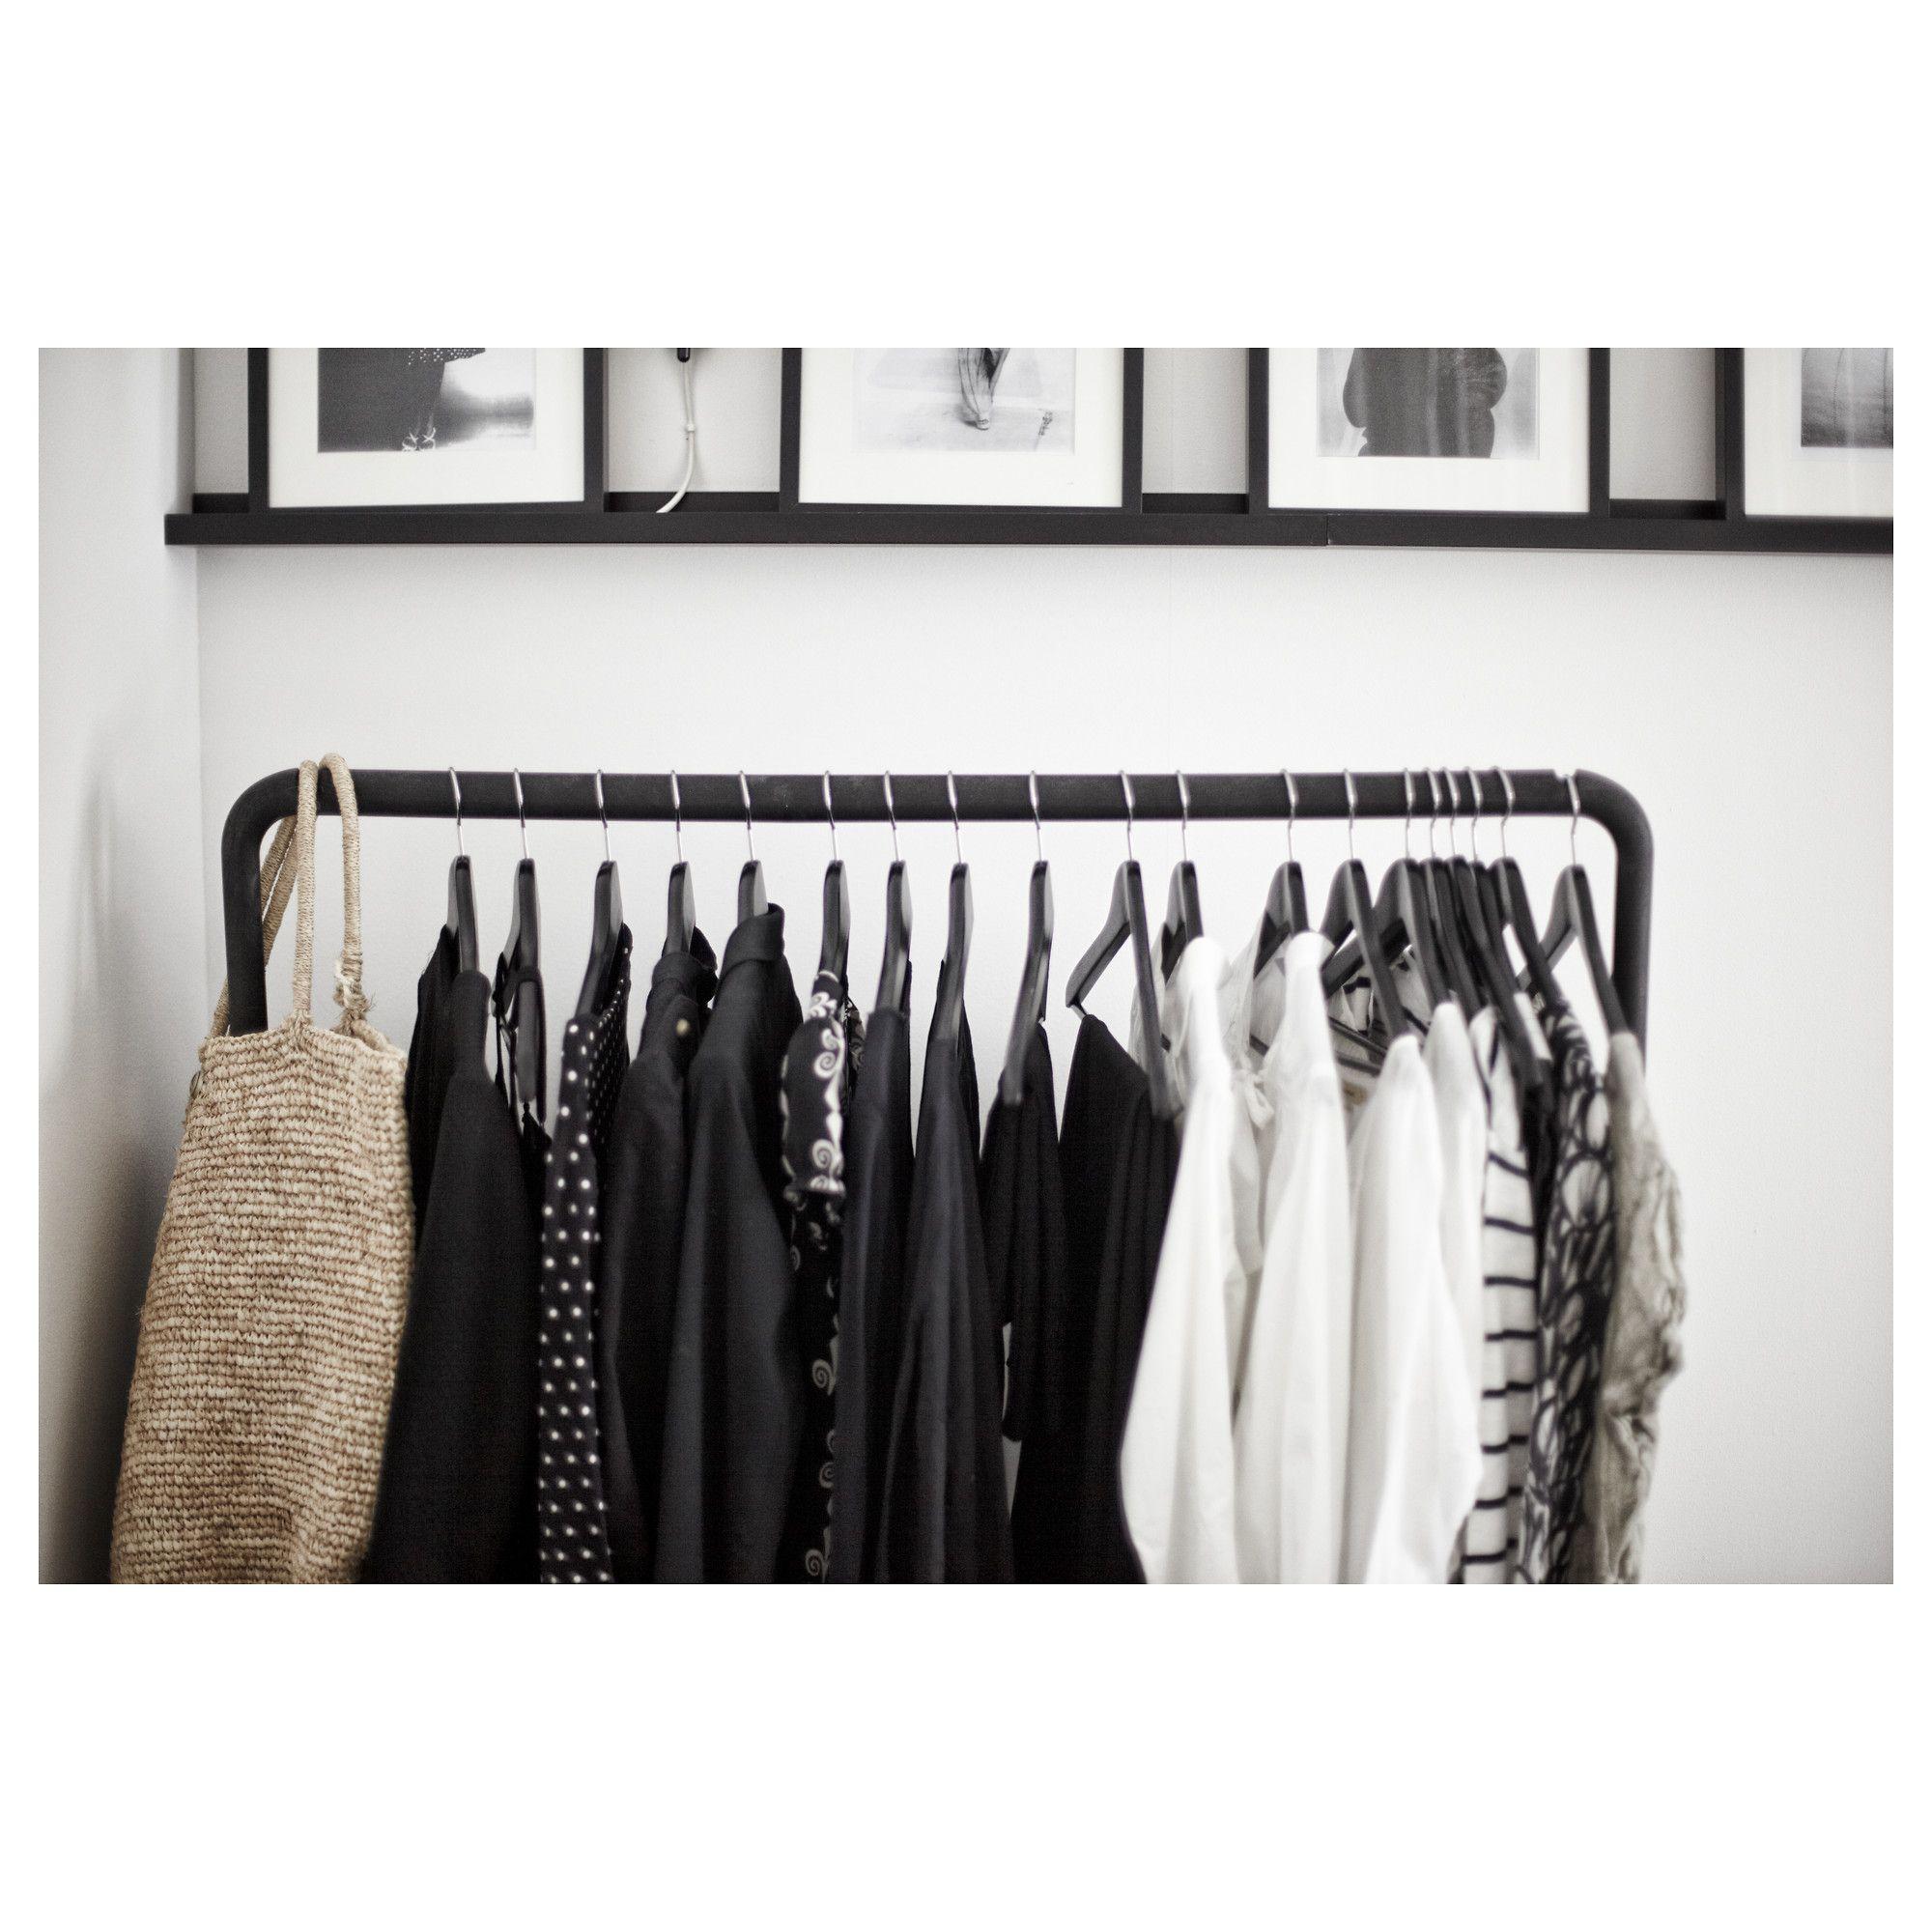 TURBO Clothes rack, indoor/outdoor, black | Be Not Fat